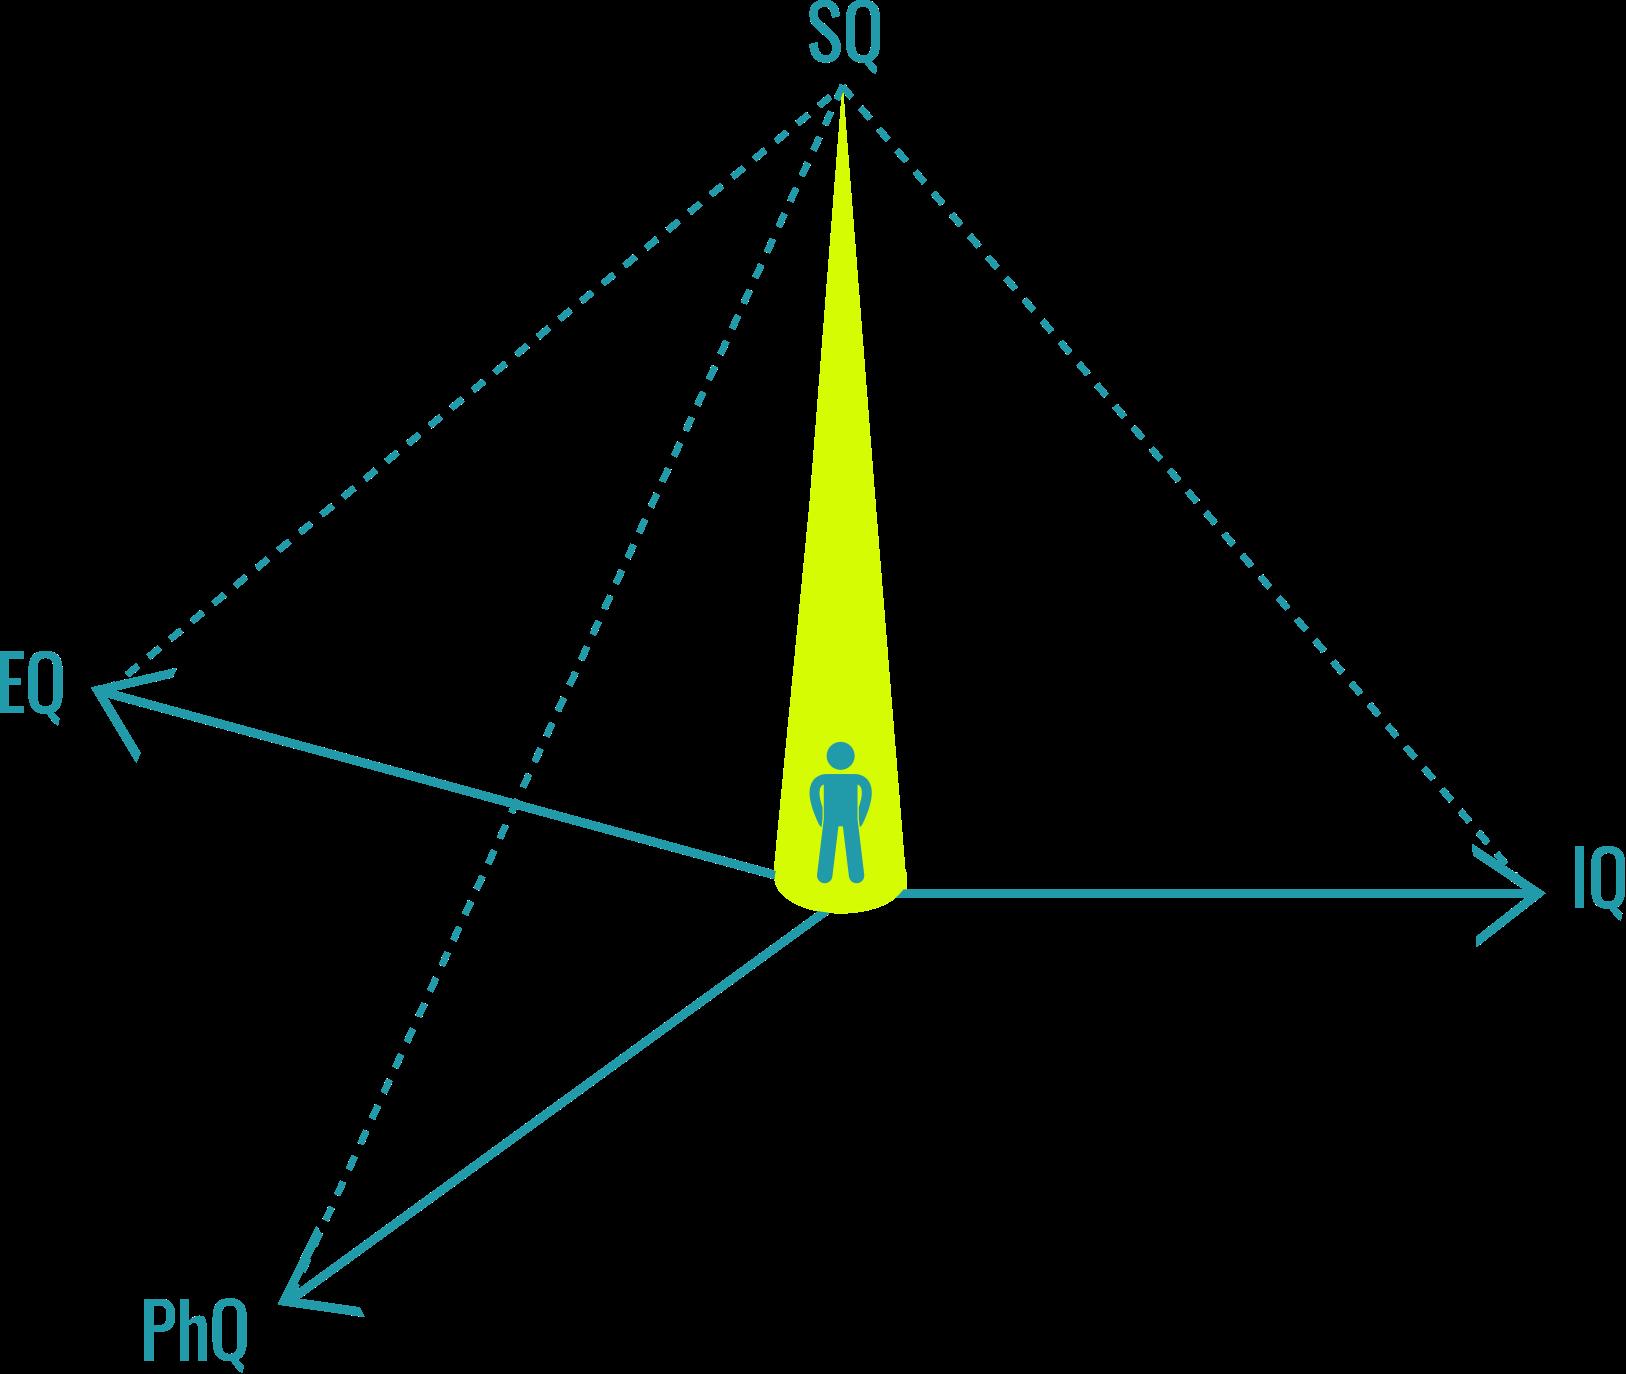 Mentally Fit - 4 axes key model